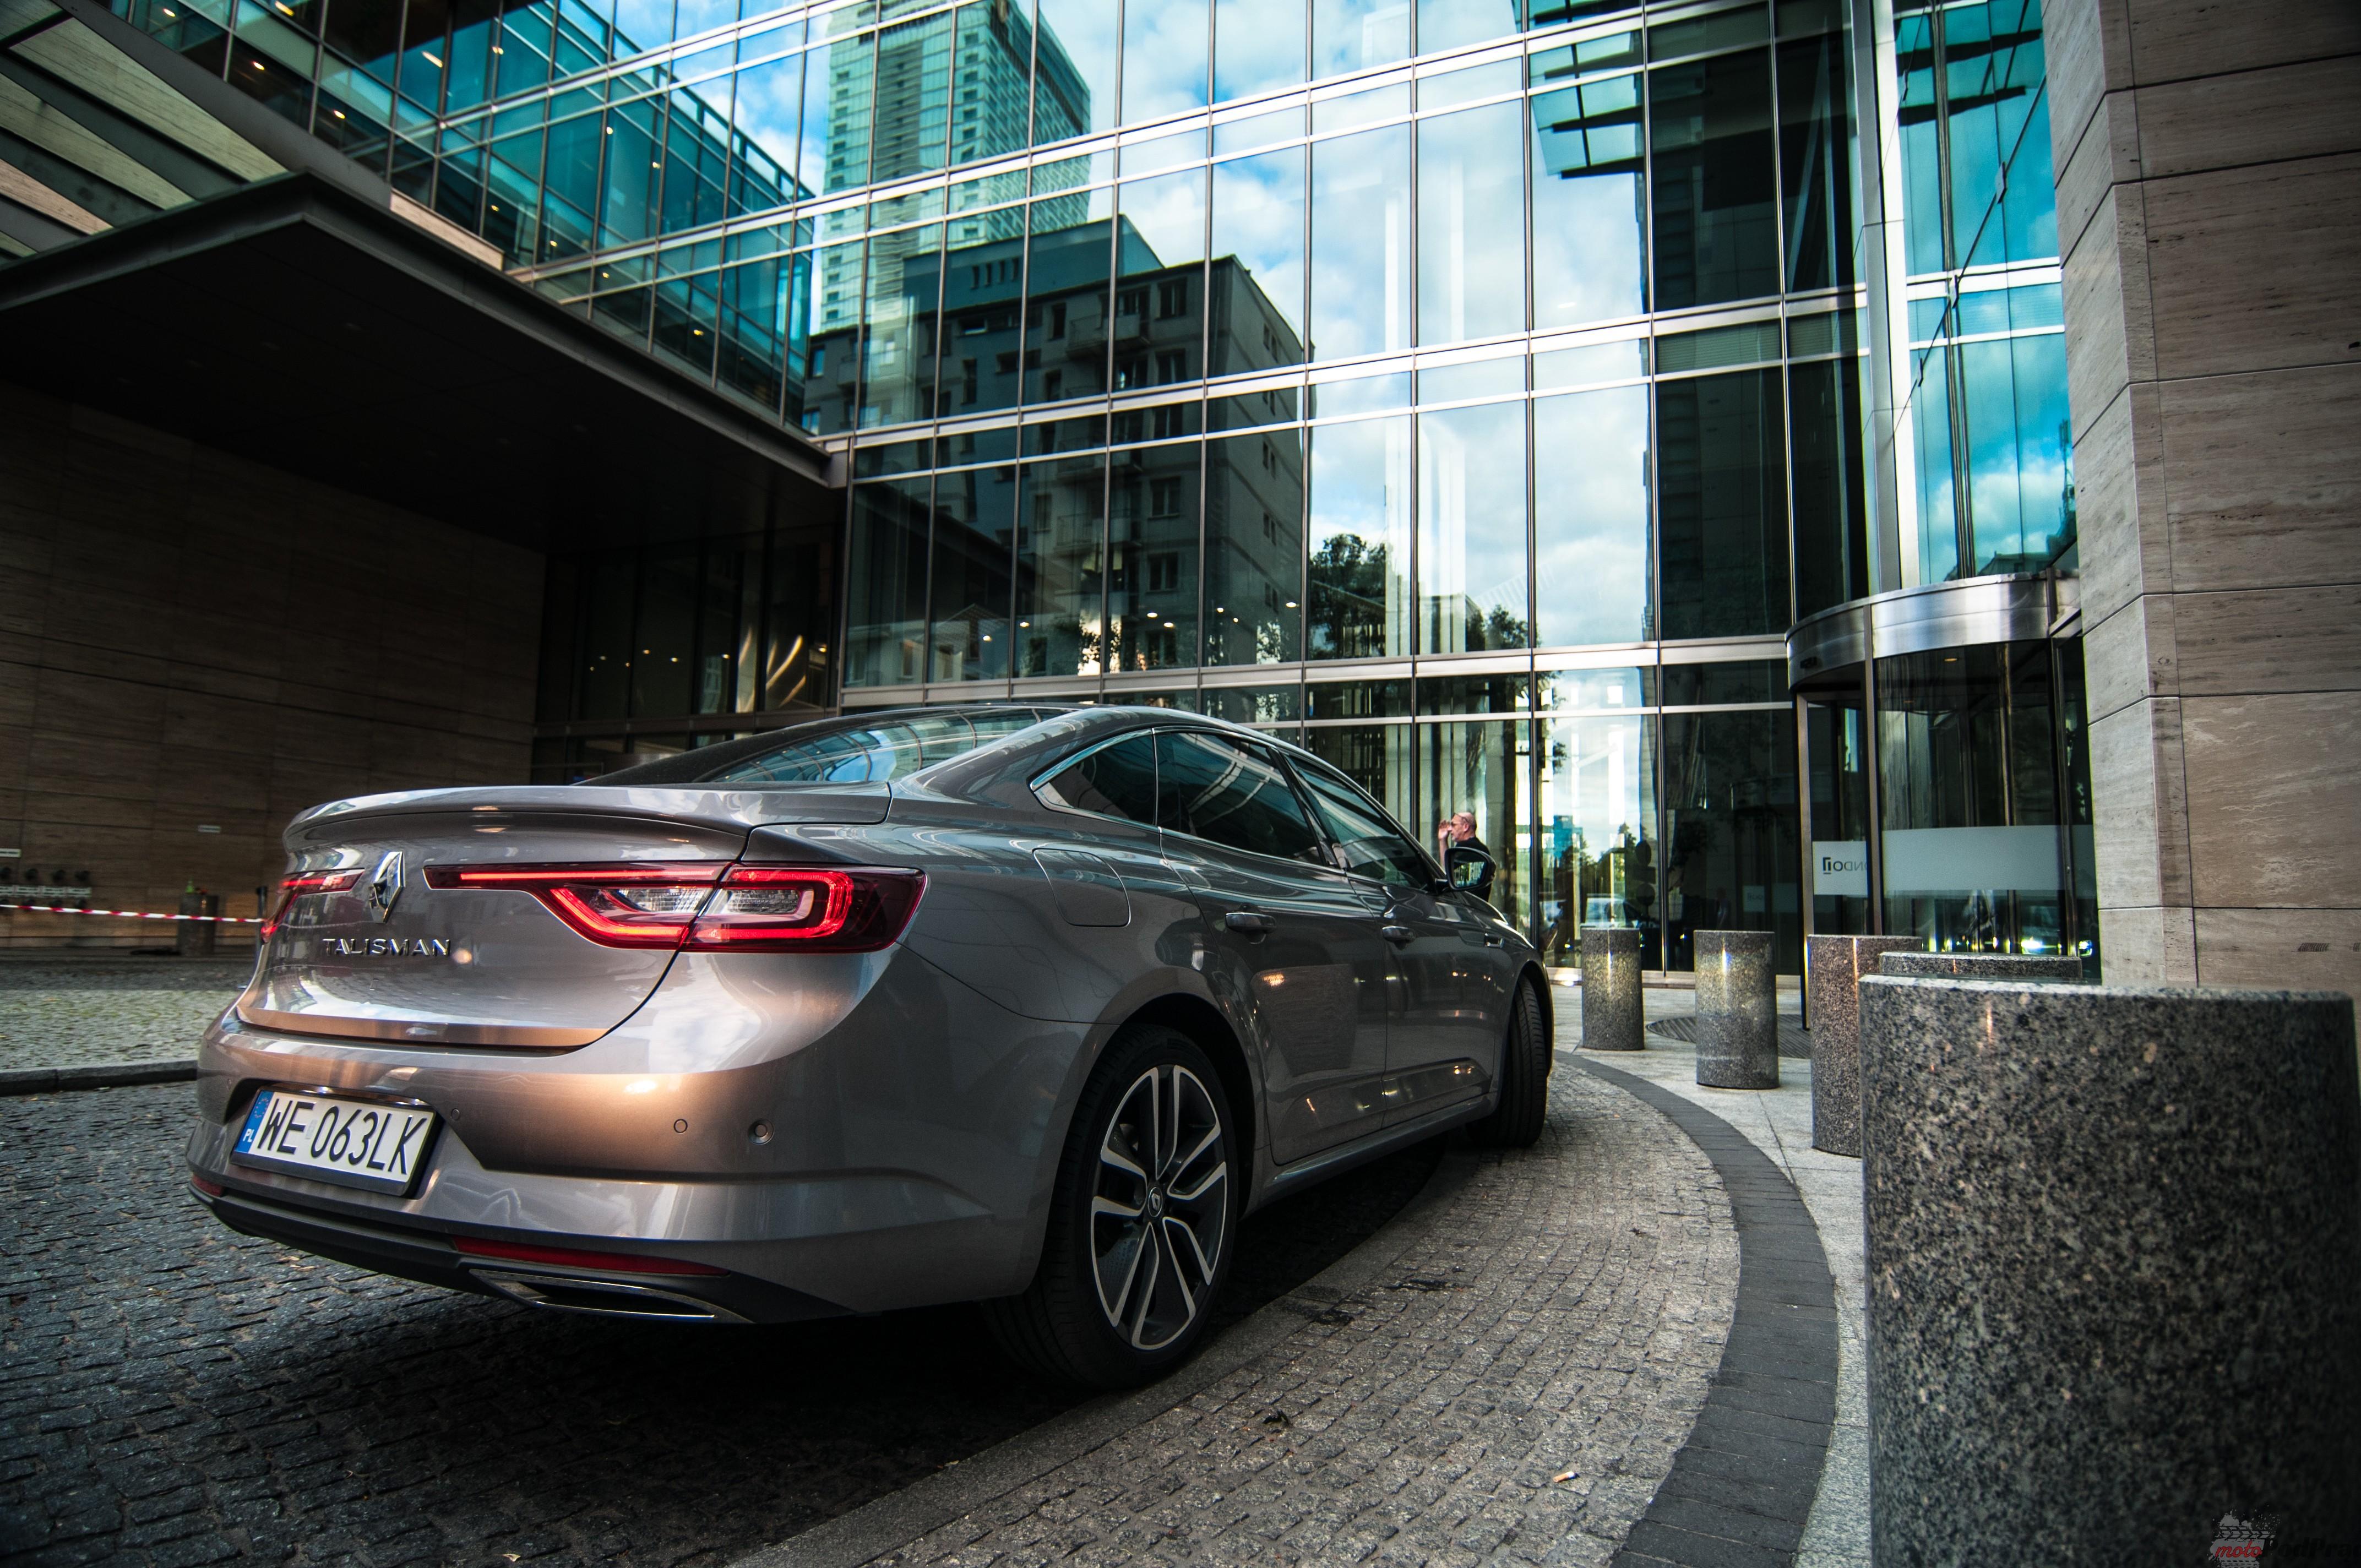 Renault Talisman 12 TEST: Renault Talisman 1.6 TCe INTENSE – firmowy reprezentant